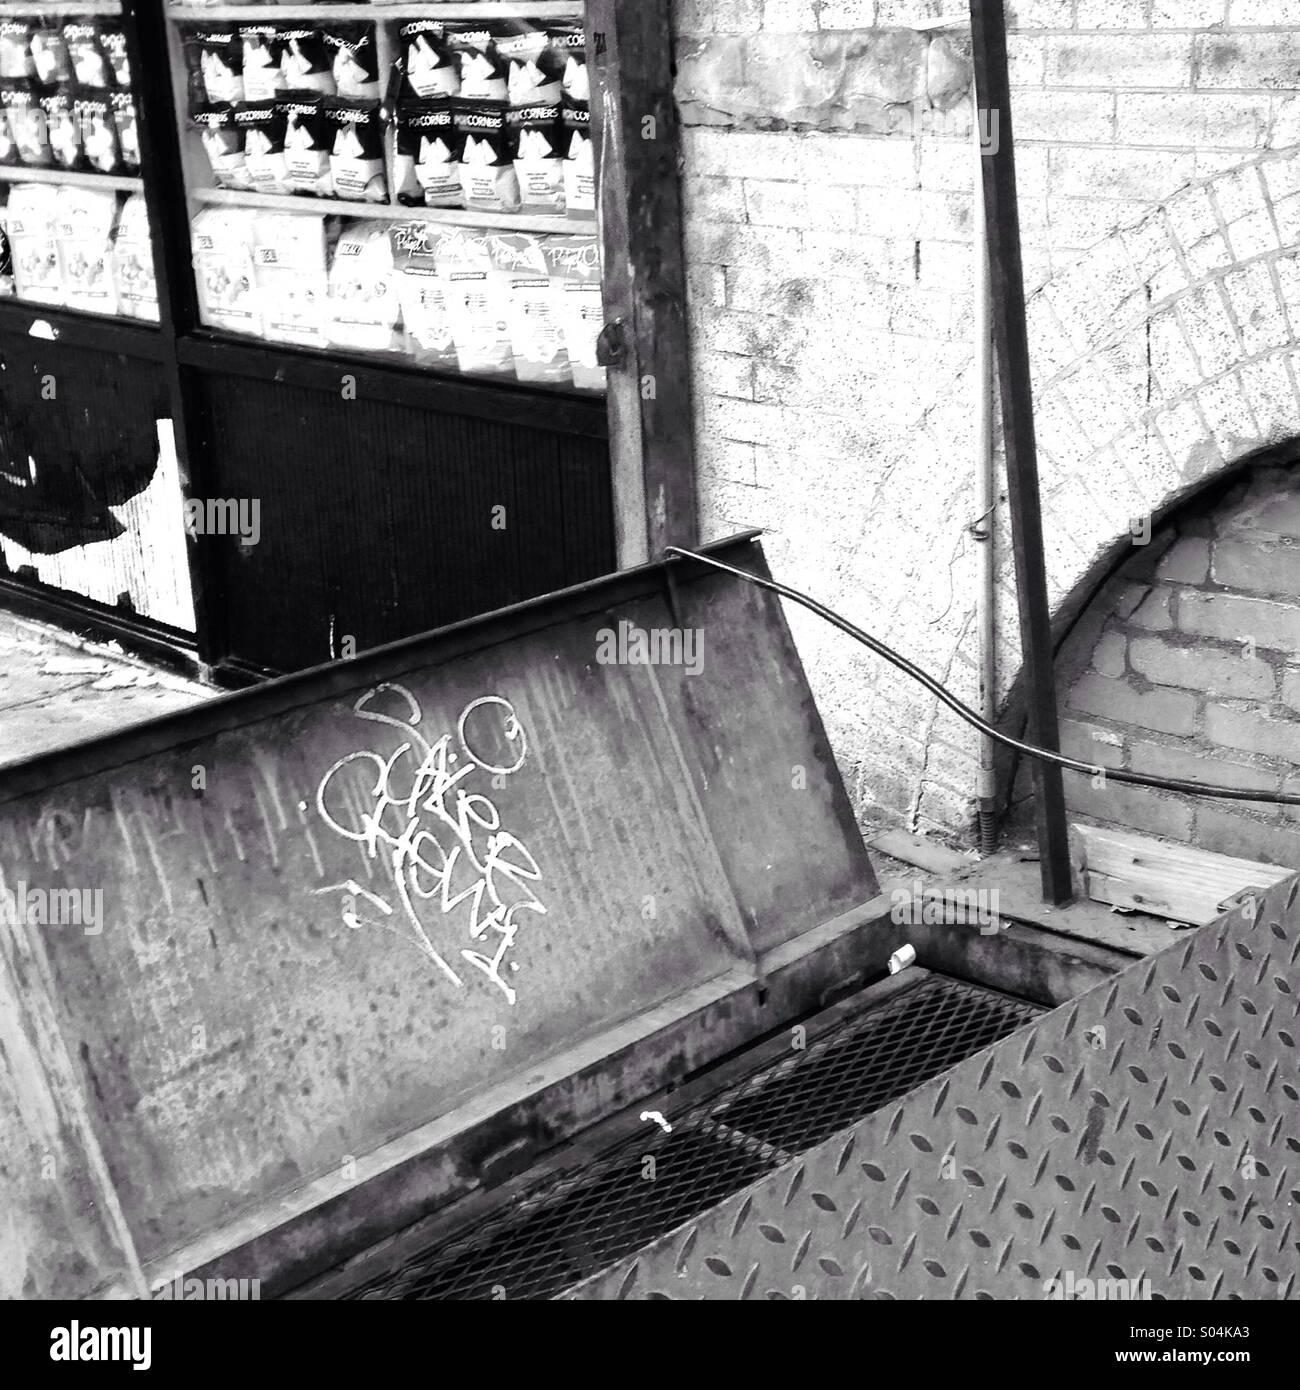 Graffitied Metal Basement Door, Brooklyn, NY   Stock Image